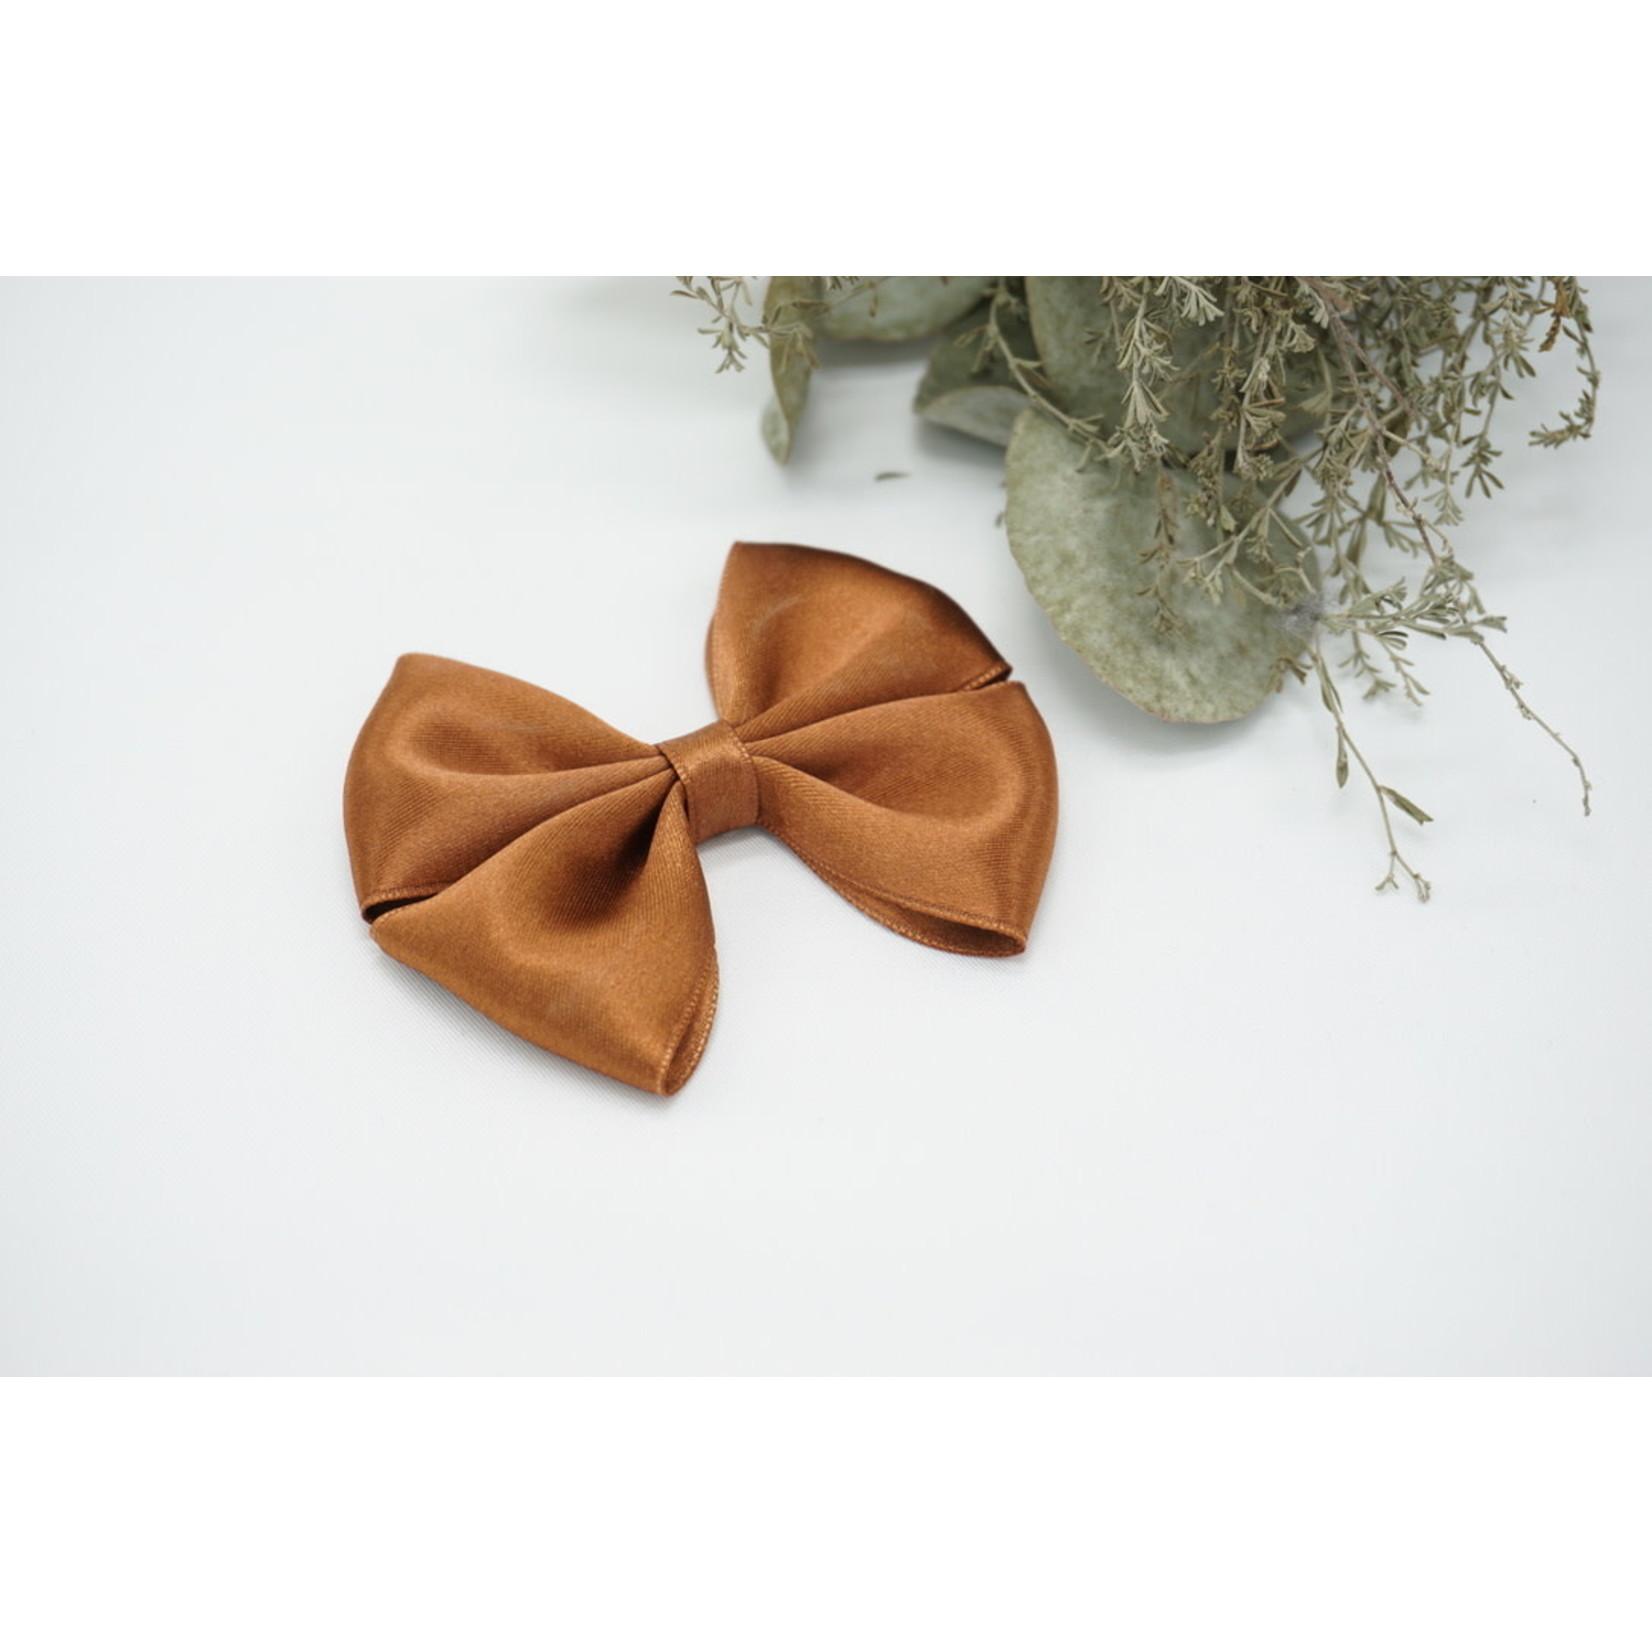 Petite Zara Satin Bow - Cinnamon